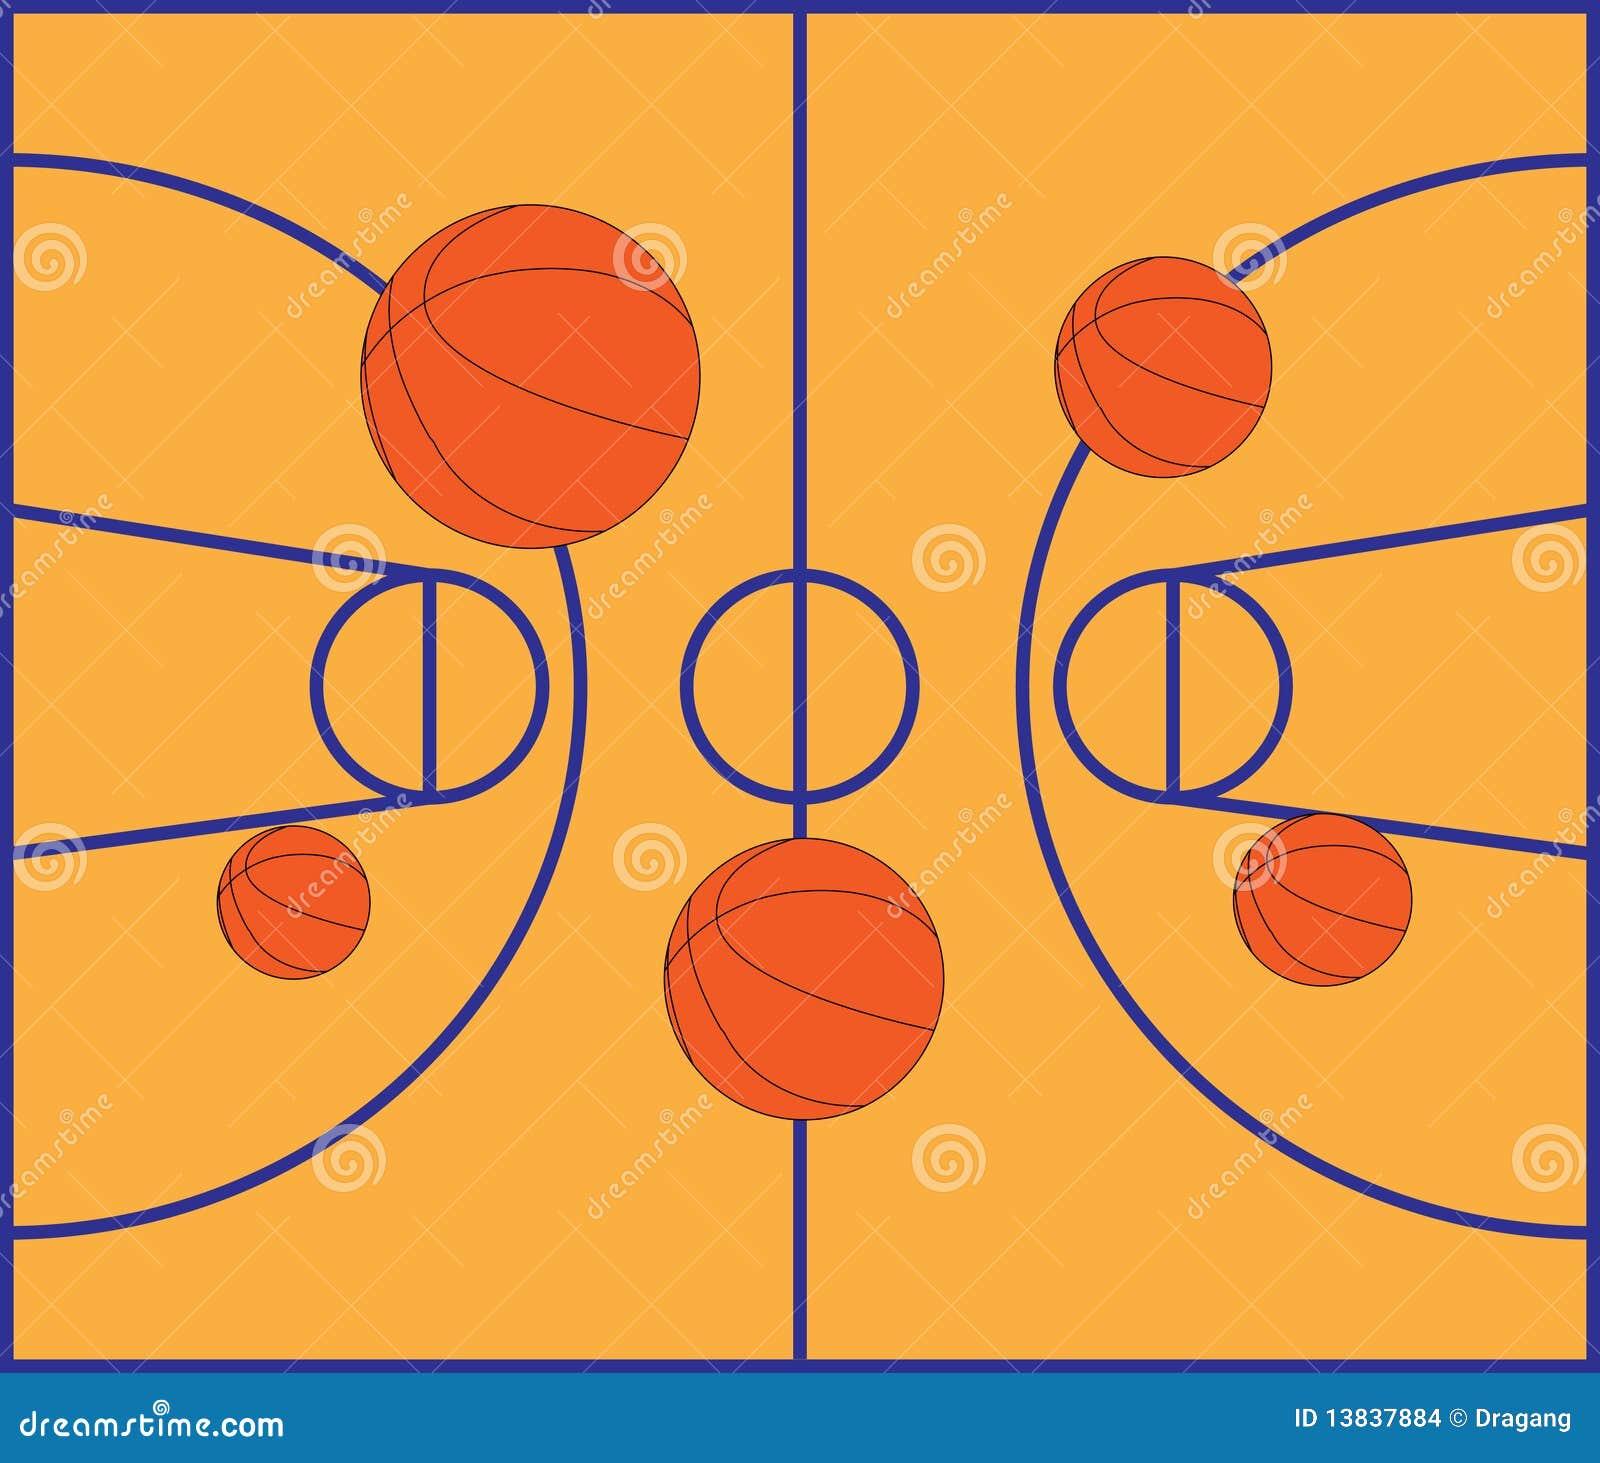 e01d52cf76d7 Basketball stock vector. Illustration of equipment, football - 13837884